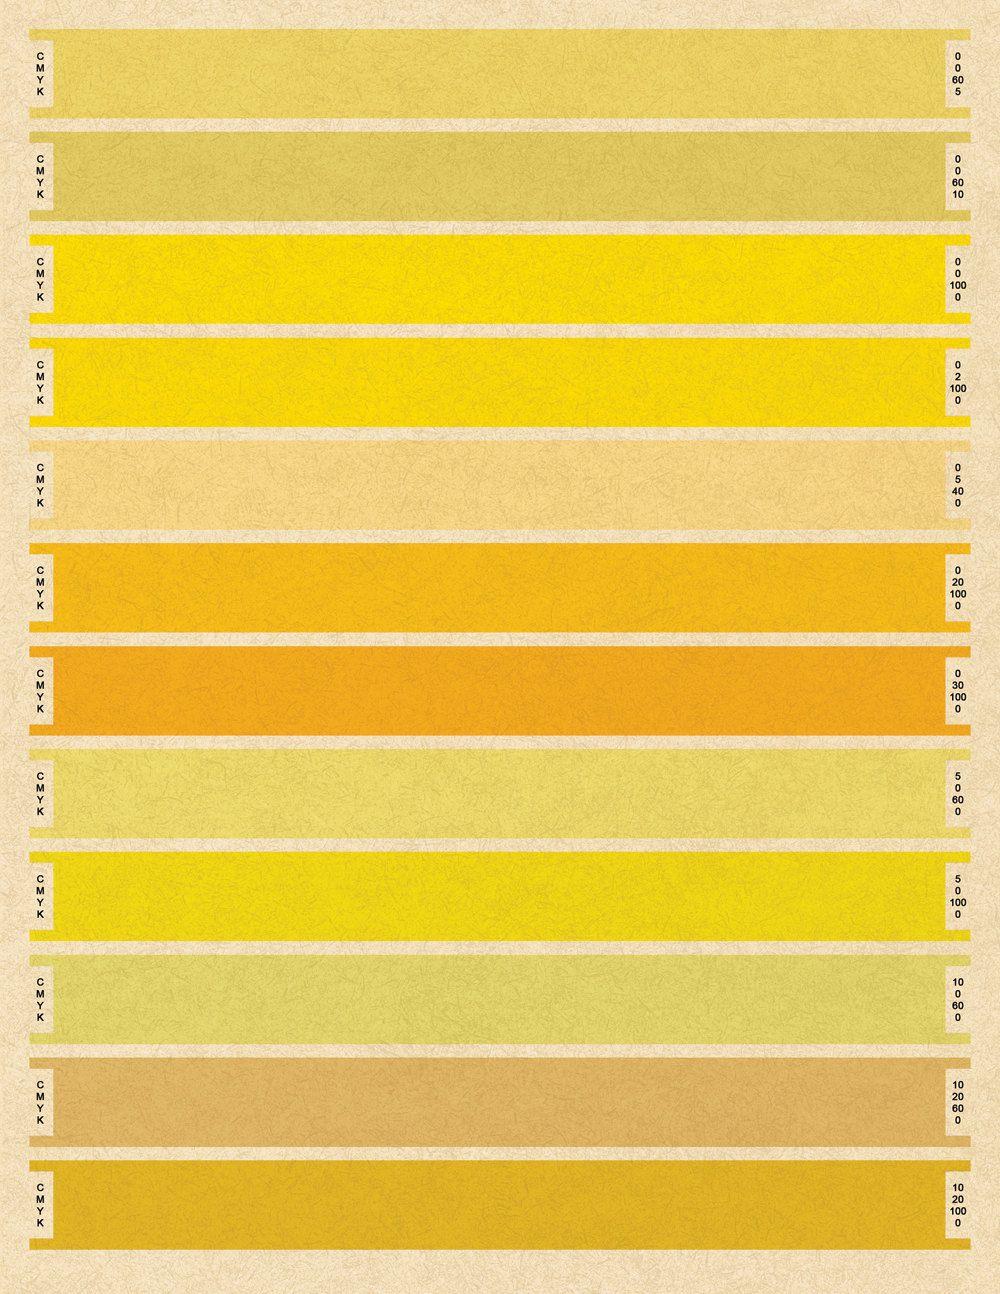 Litmus Yellow CMYK Print   love the color- yellow   Yellow